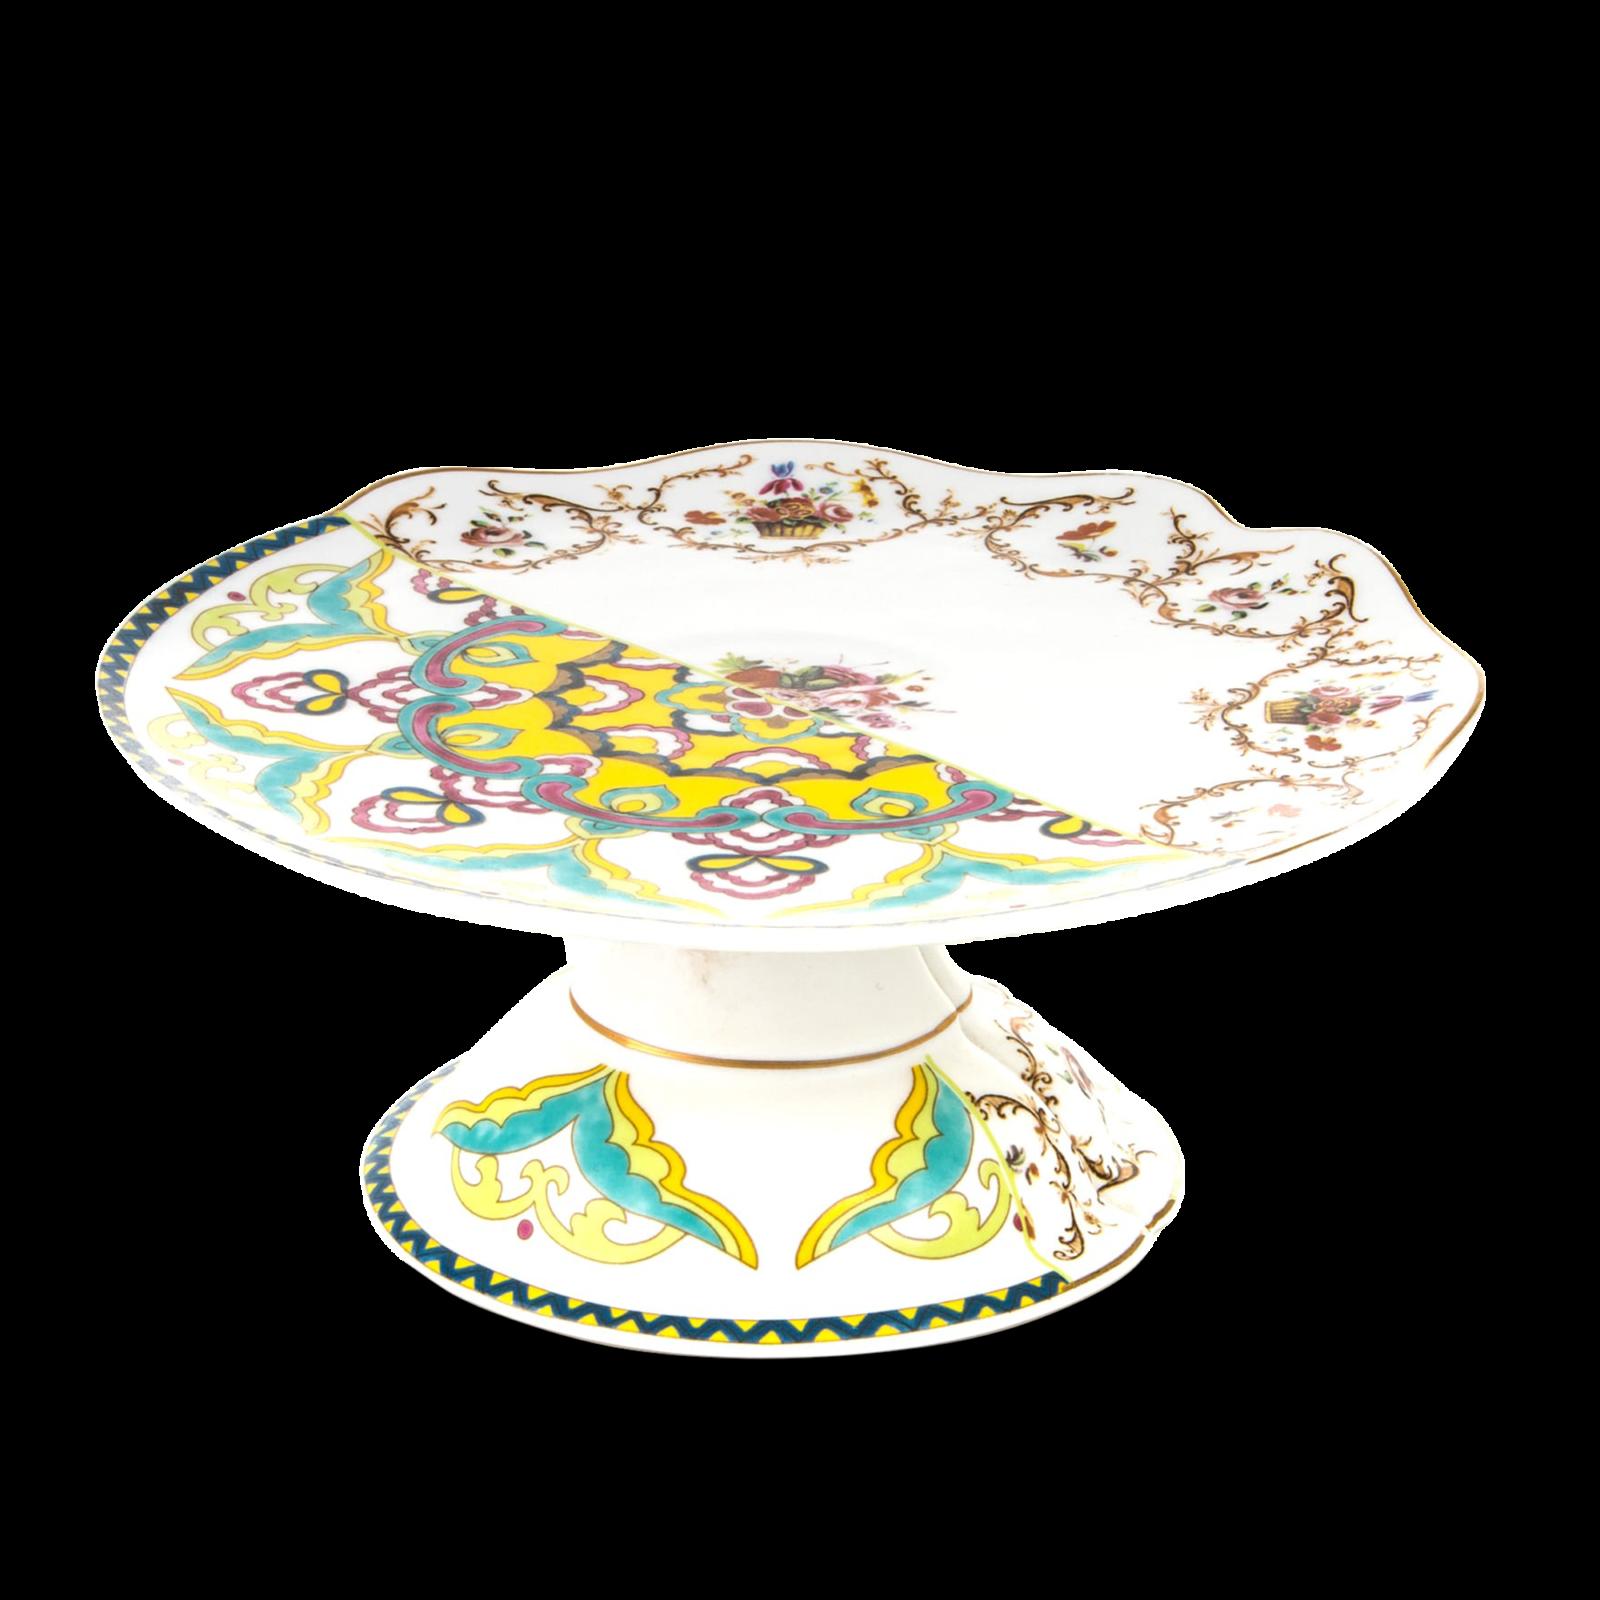 Clipart cake platter. Seletti hybrid collection leandra